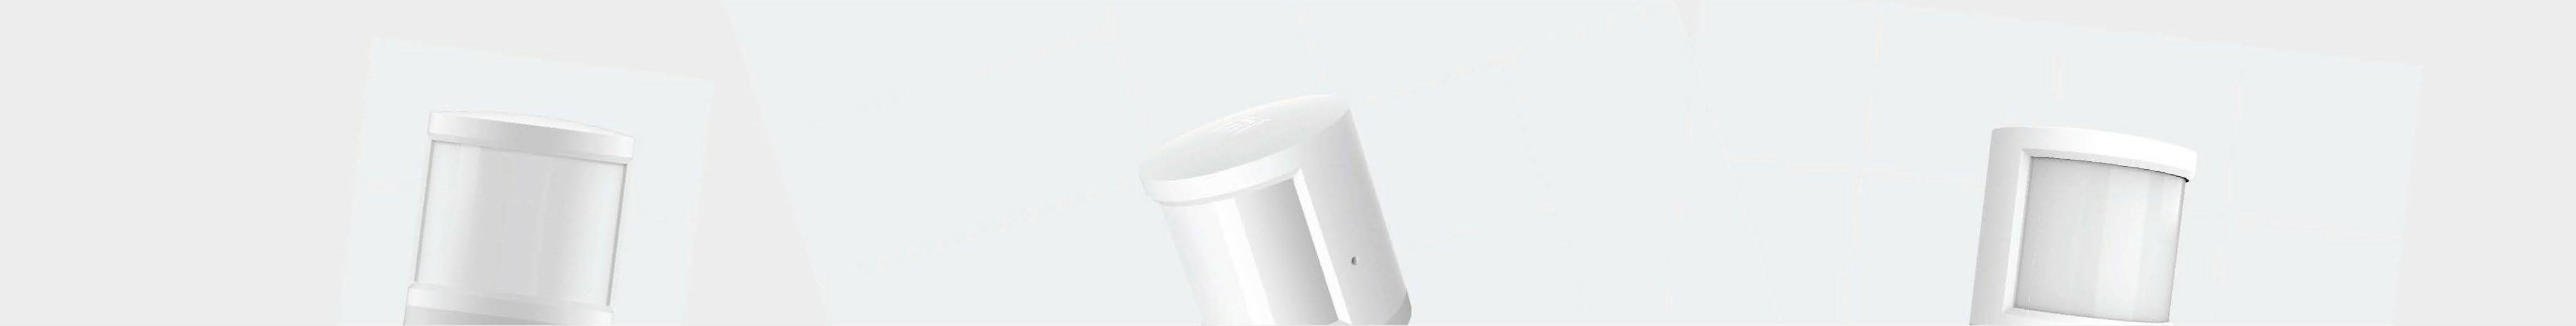 xiaomi-mi-motion-sensor-t10